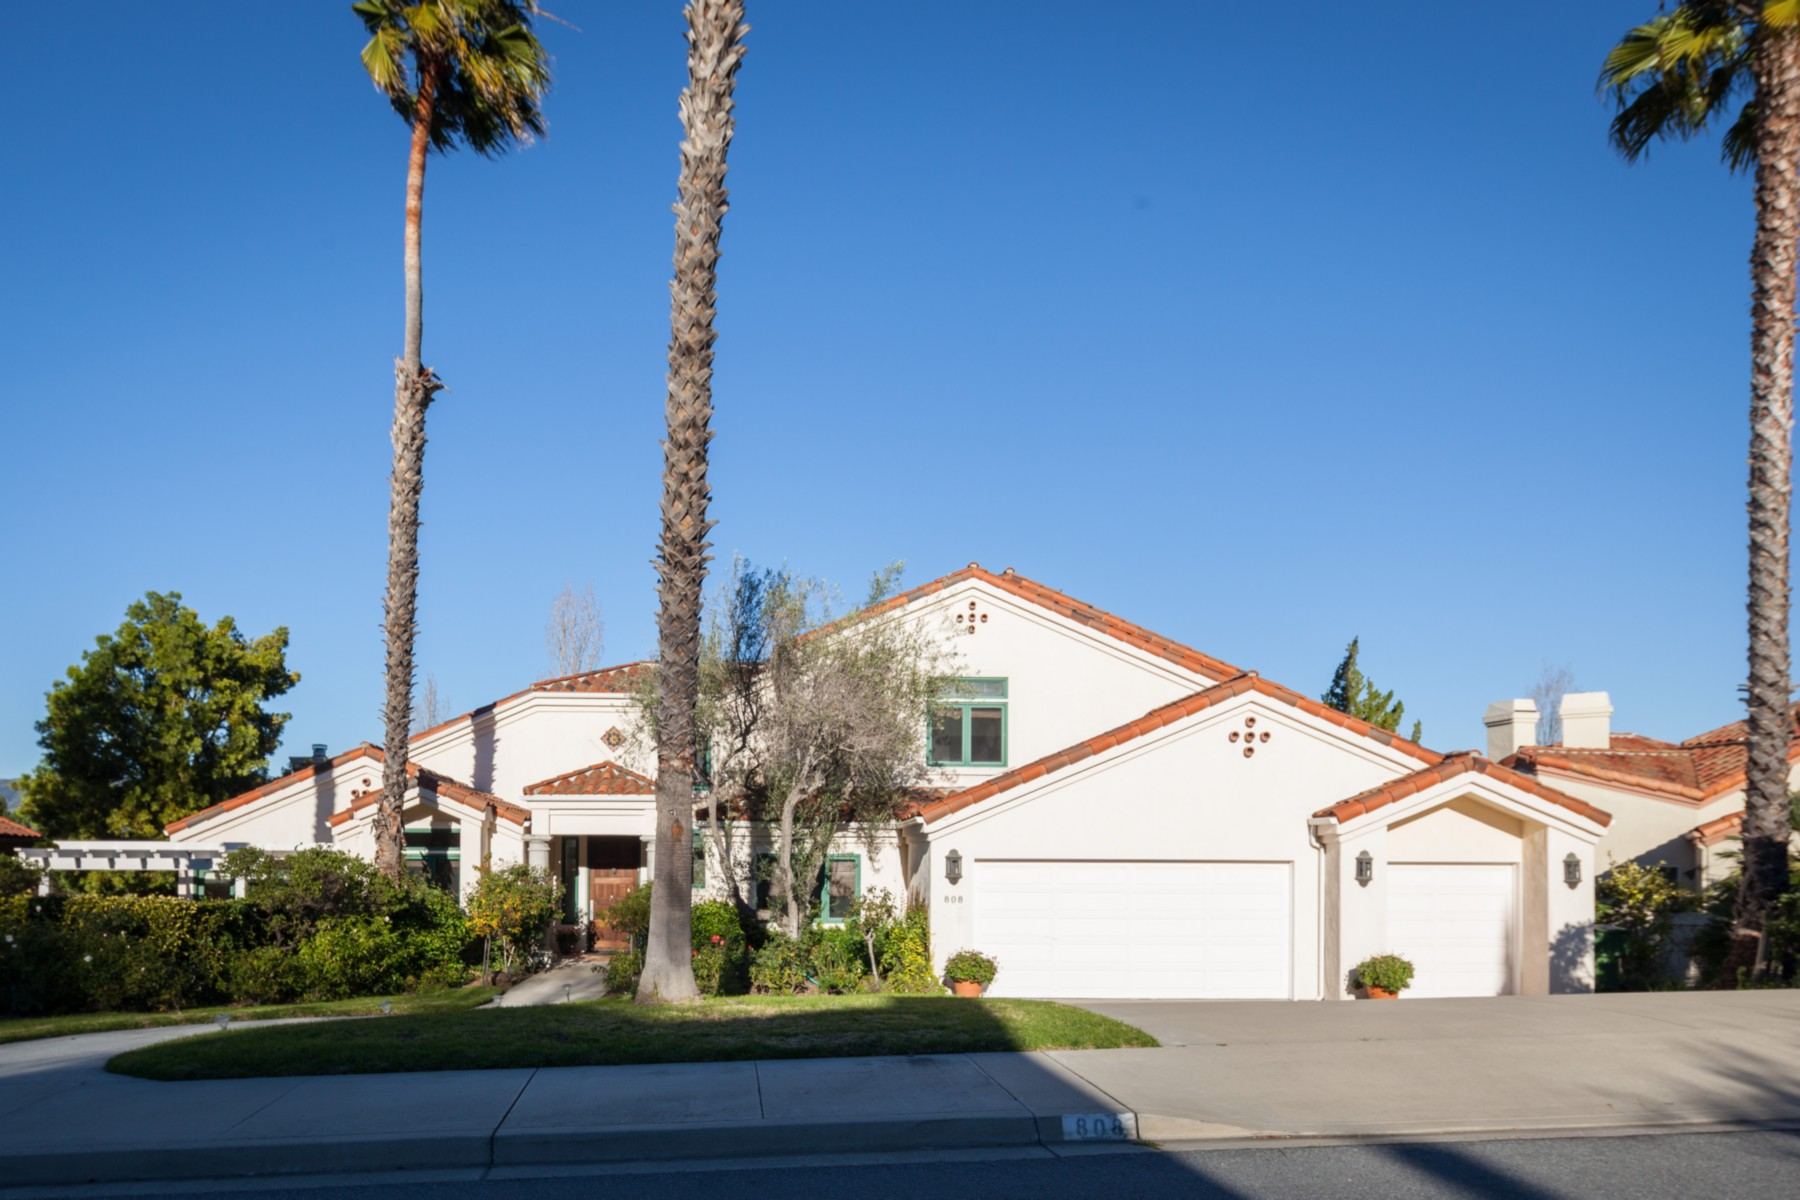 Casa para uma família para Venda às 7th Fairway Mediterranean Home 808 Greystone San Luis Obispo, Califórnia, 93401 Estados Unidos